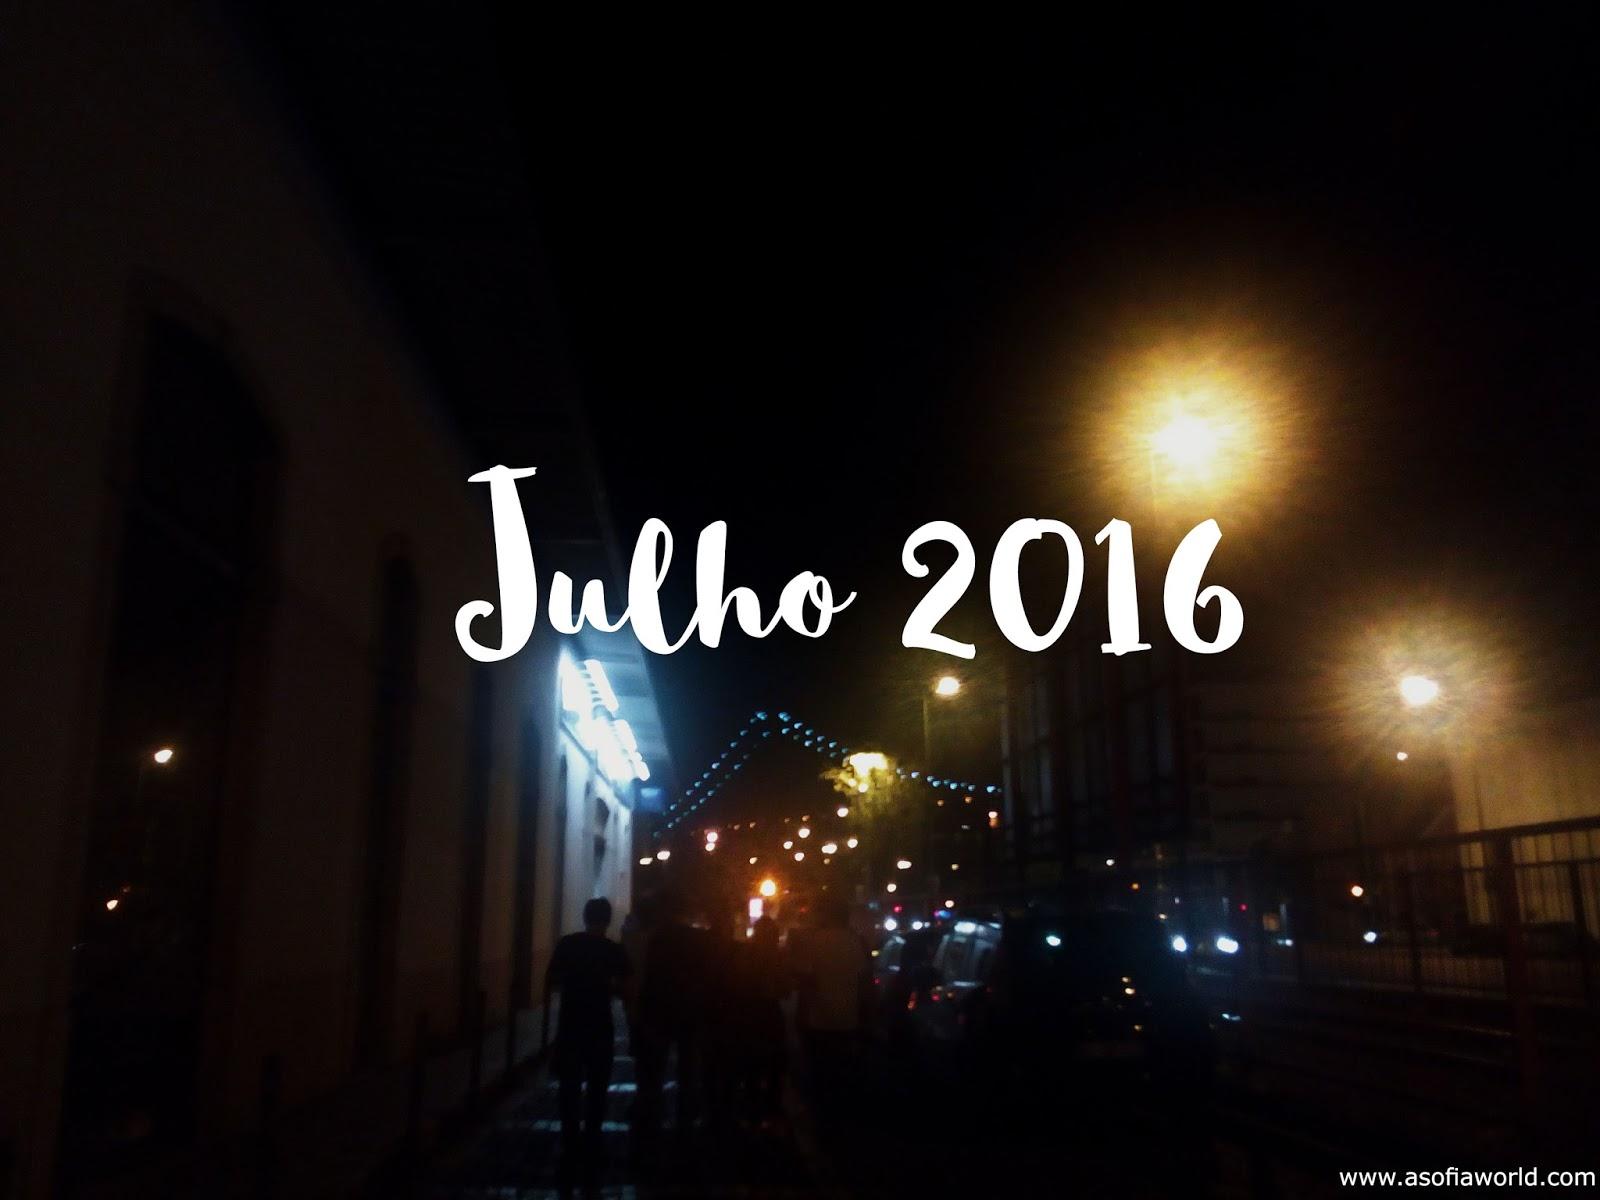 Favoritos: Julho 2016